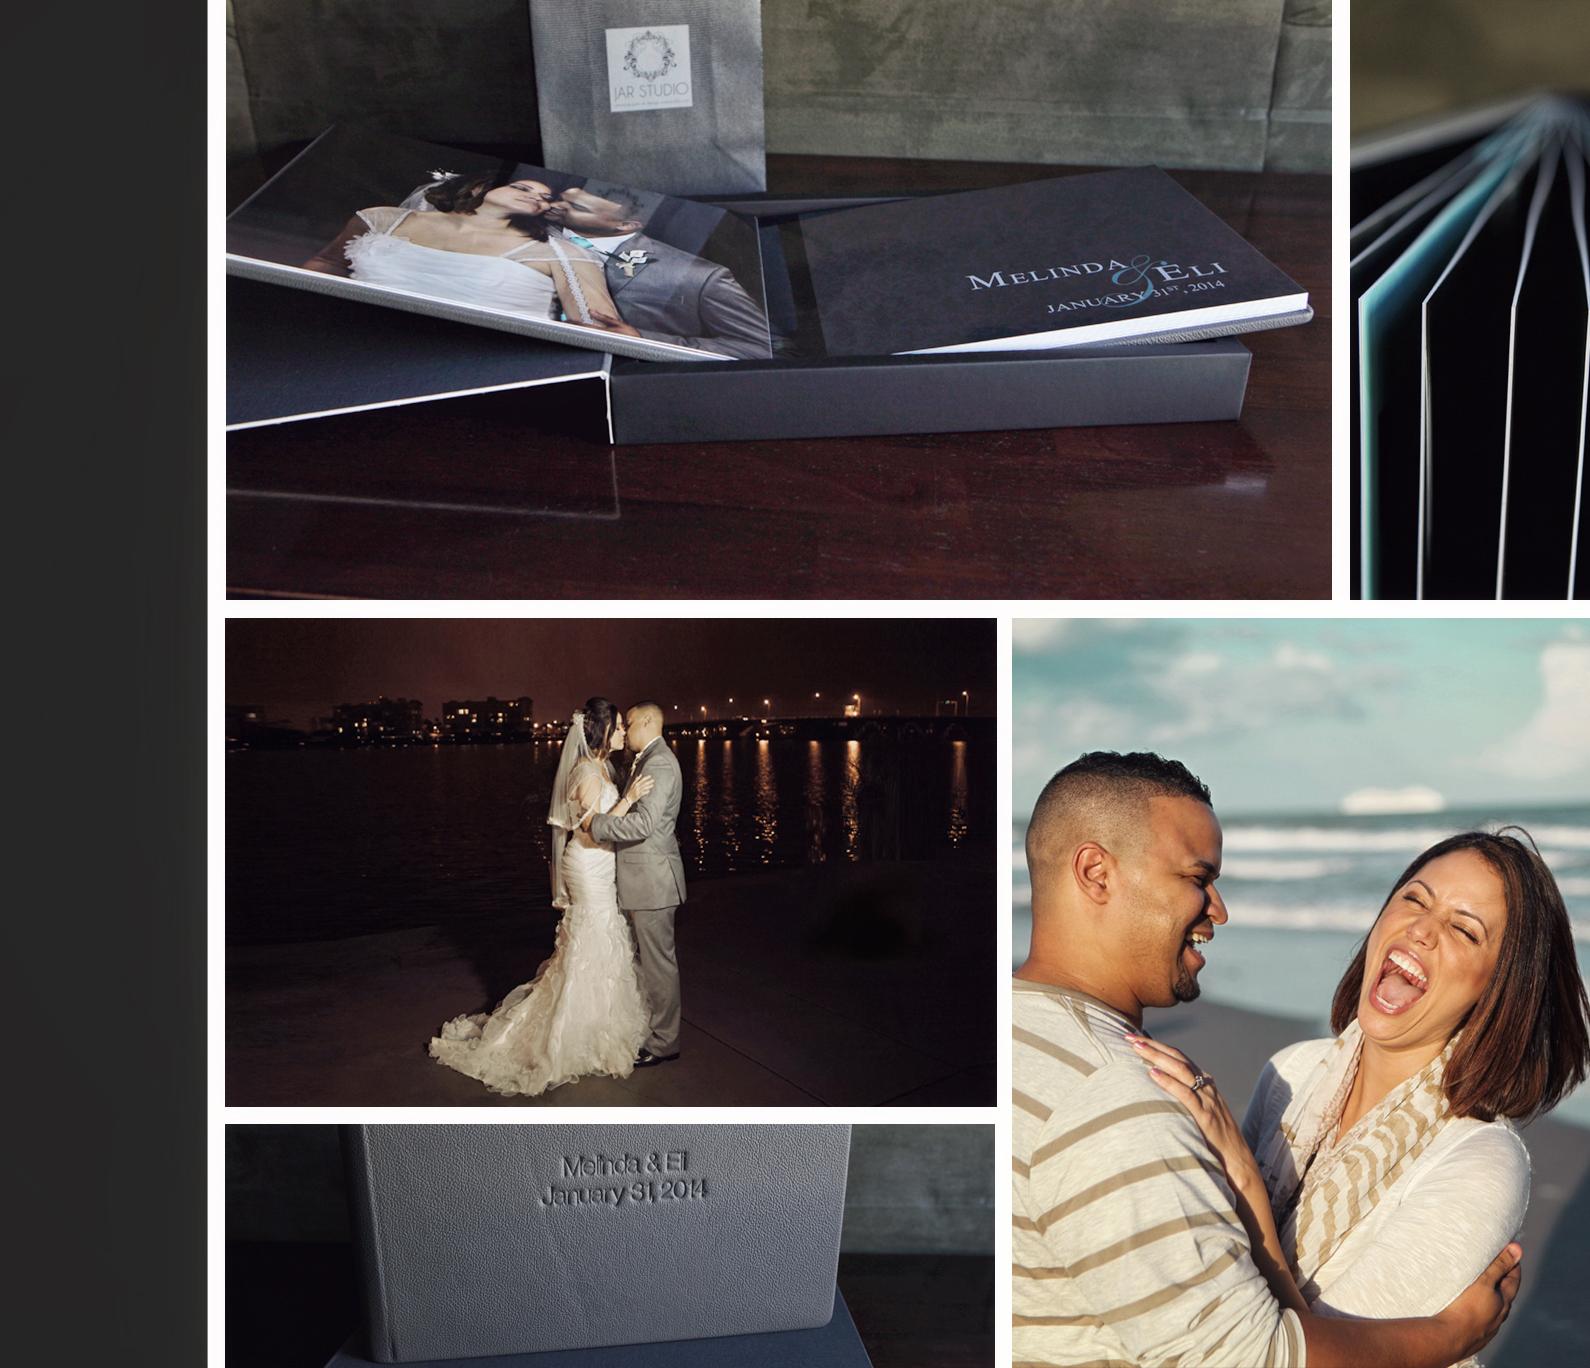 02-maitland-wedding-photographer-modern-artistic-album.jpg